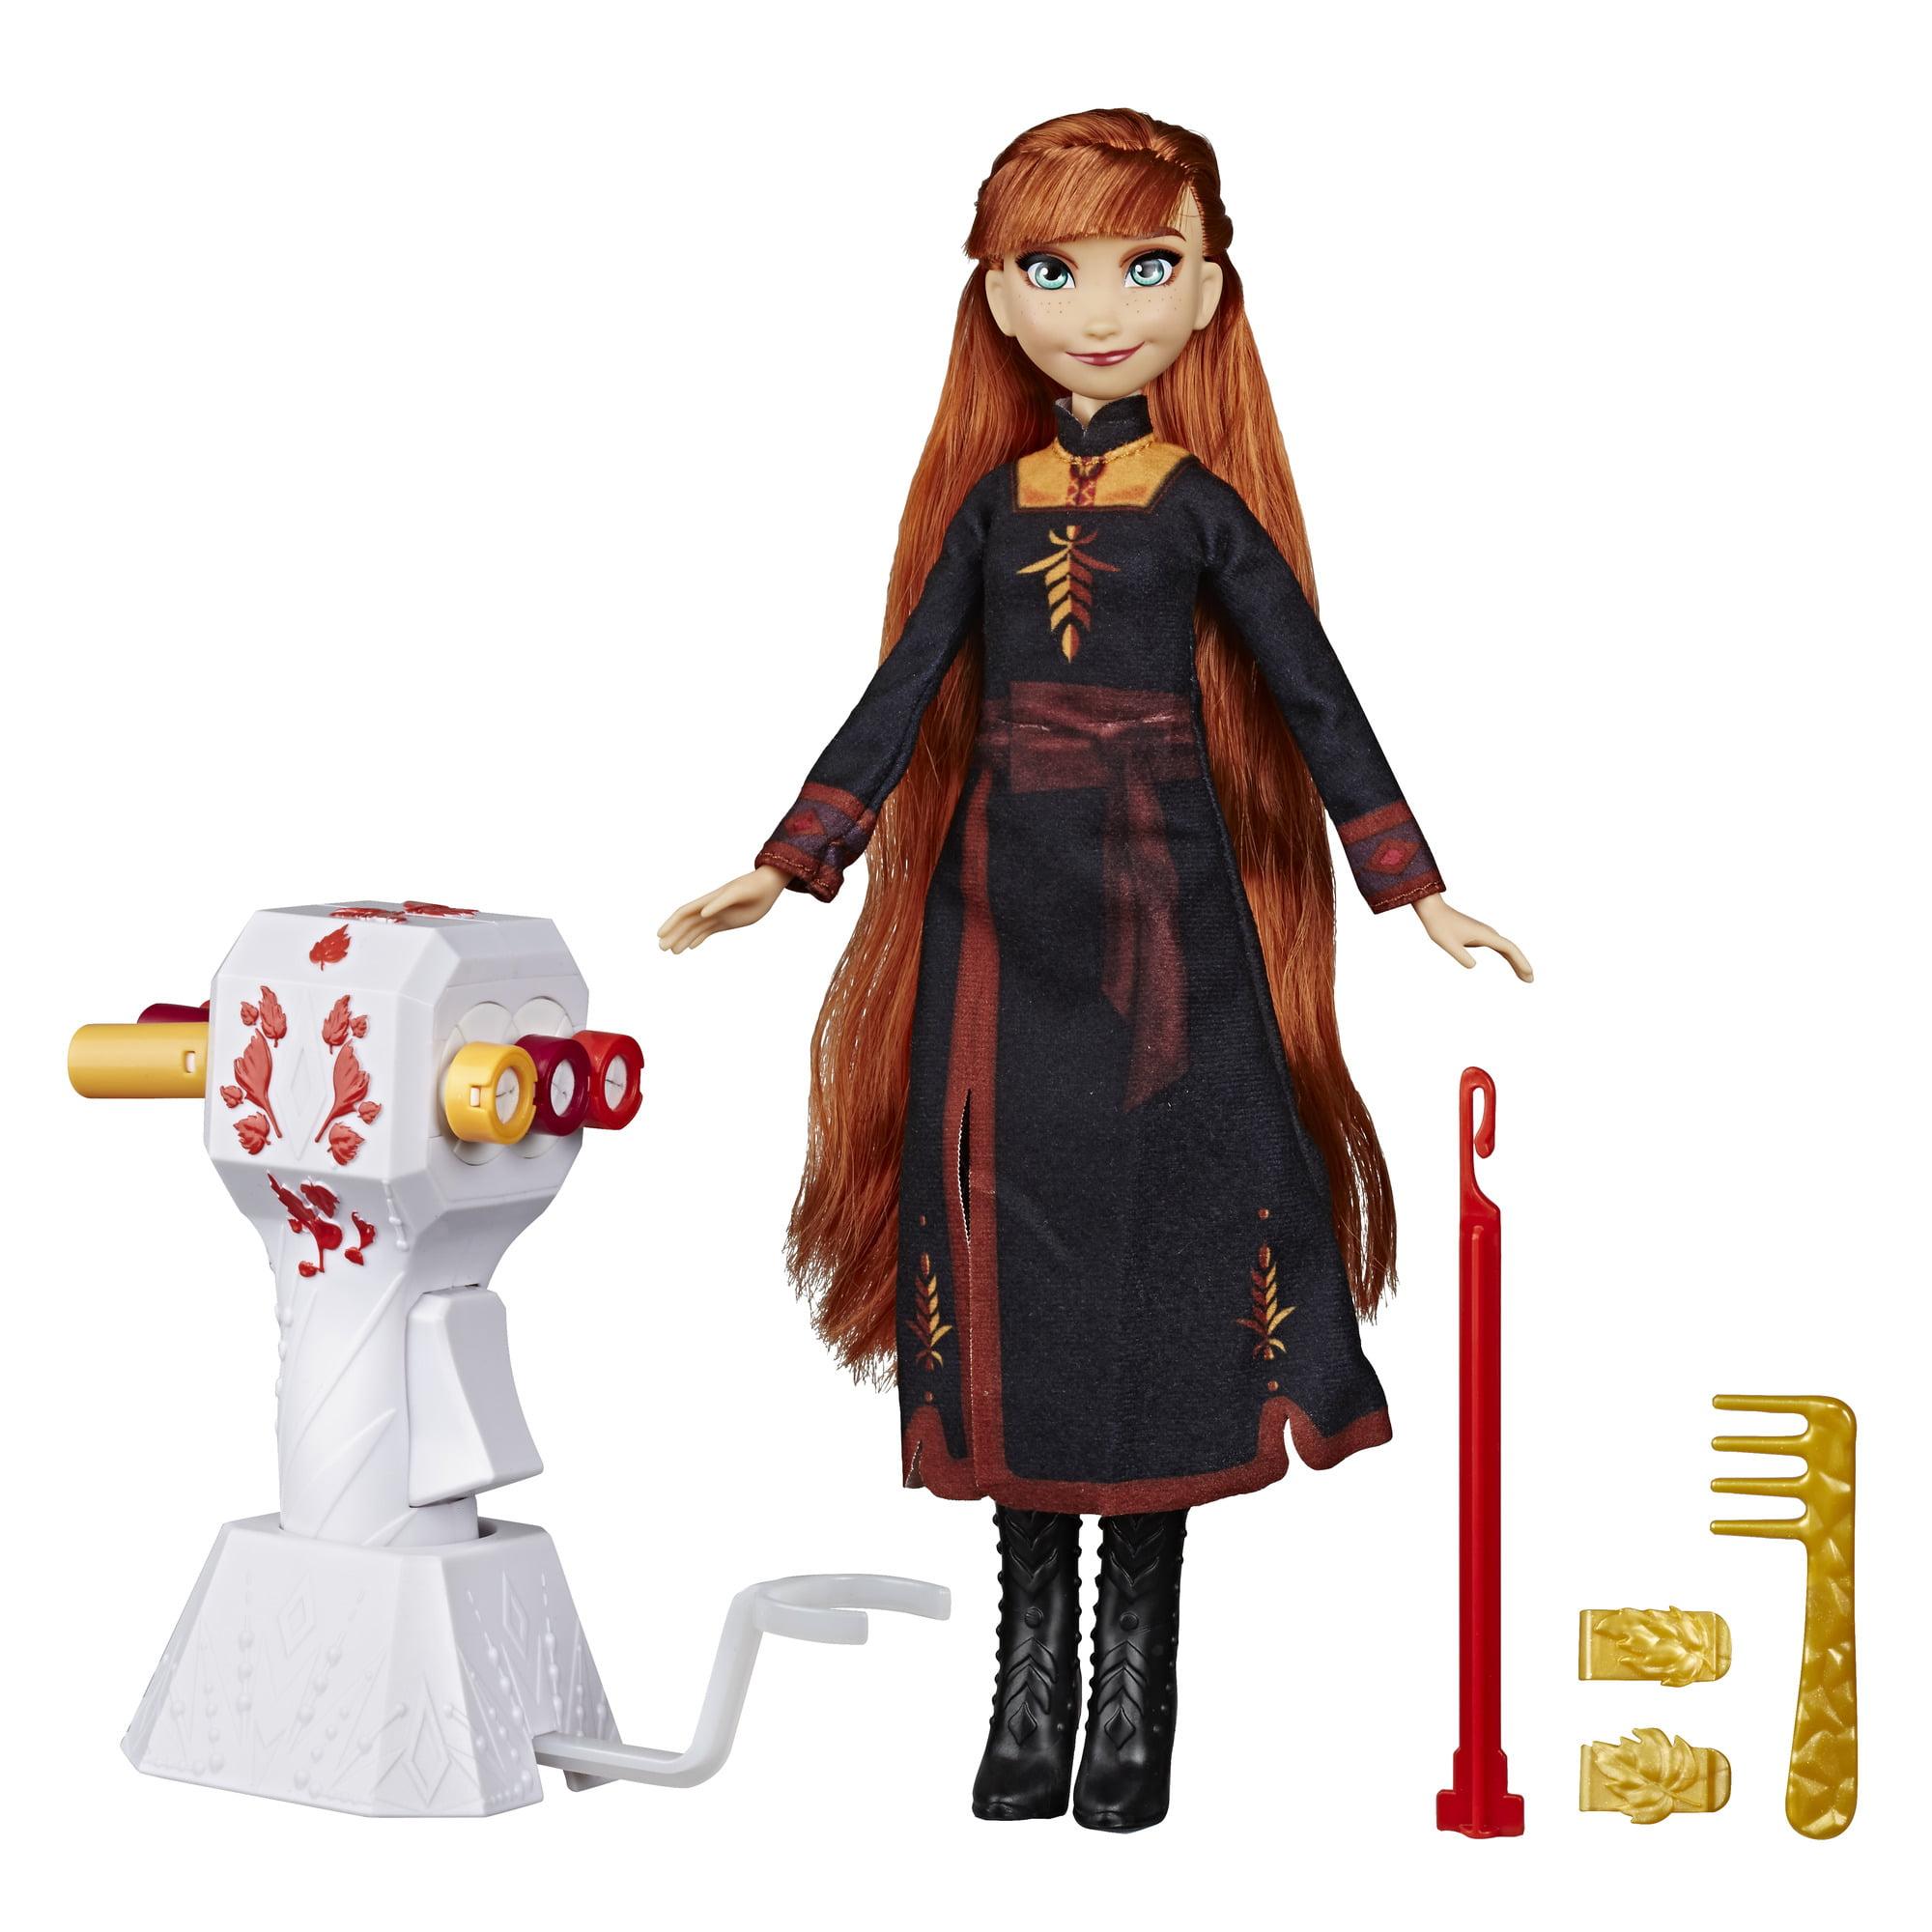 Disney Frozen 2 Sister Styles Long Hair Anna Fashion Doll with Automatic Hair Braiding Tool